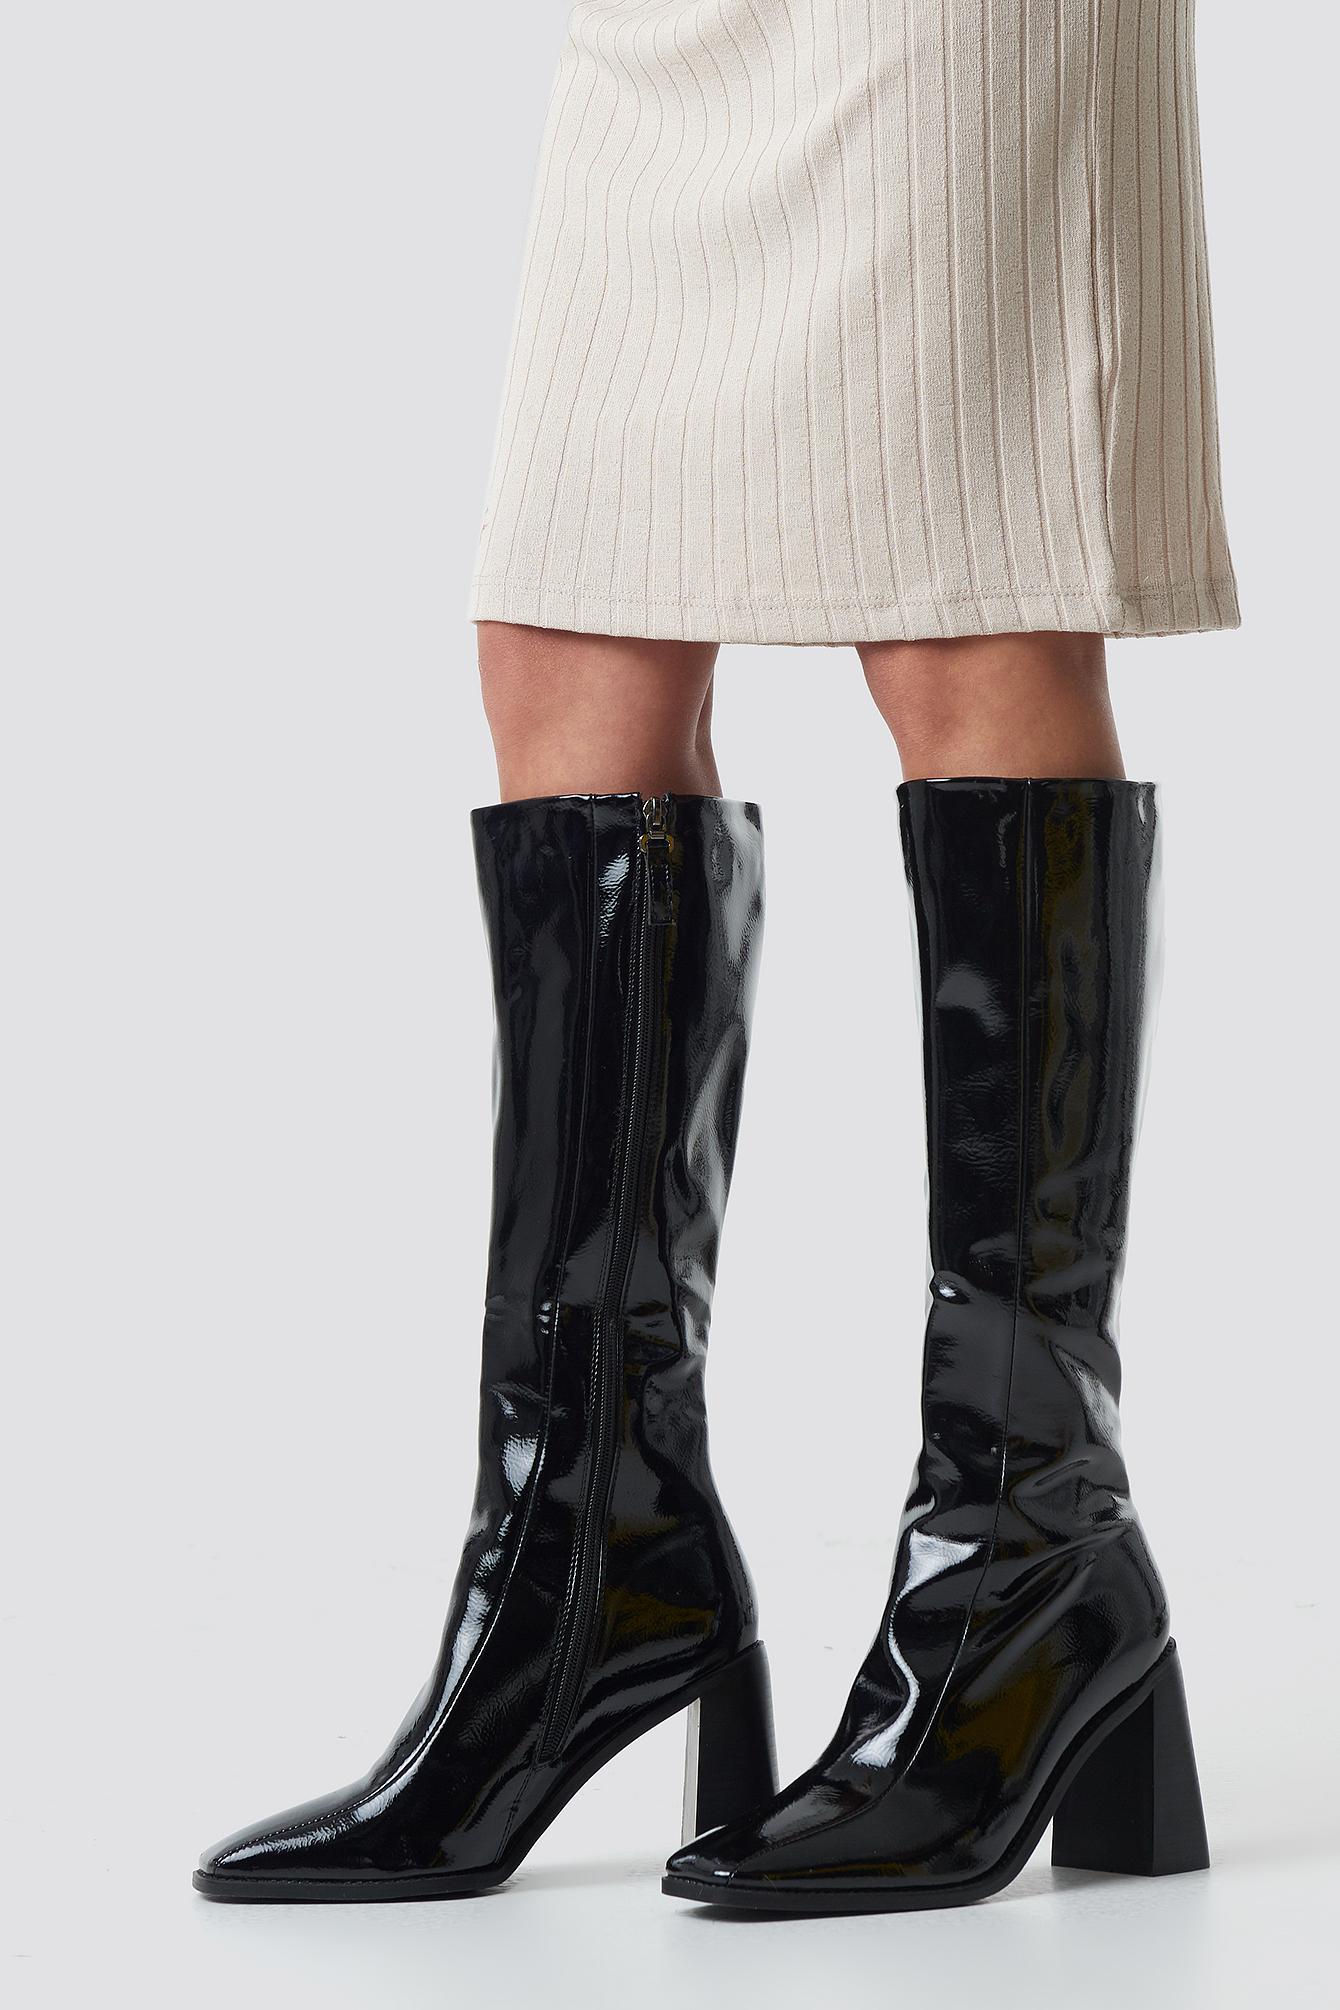 raid -  Lenore Long Boot - Black